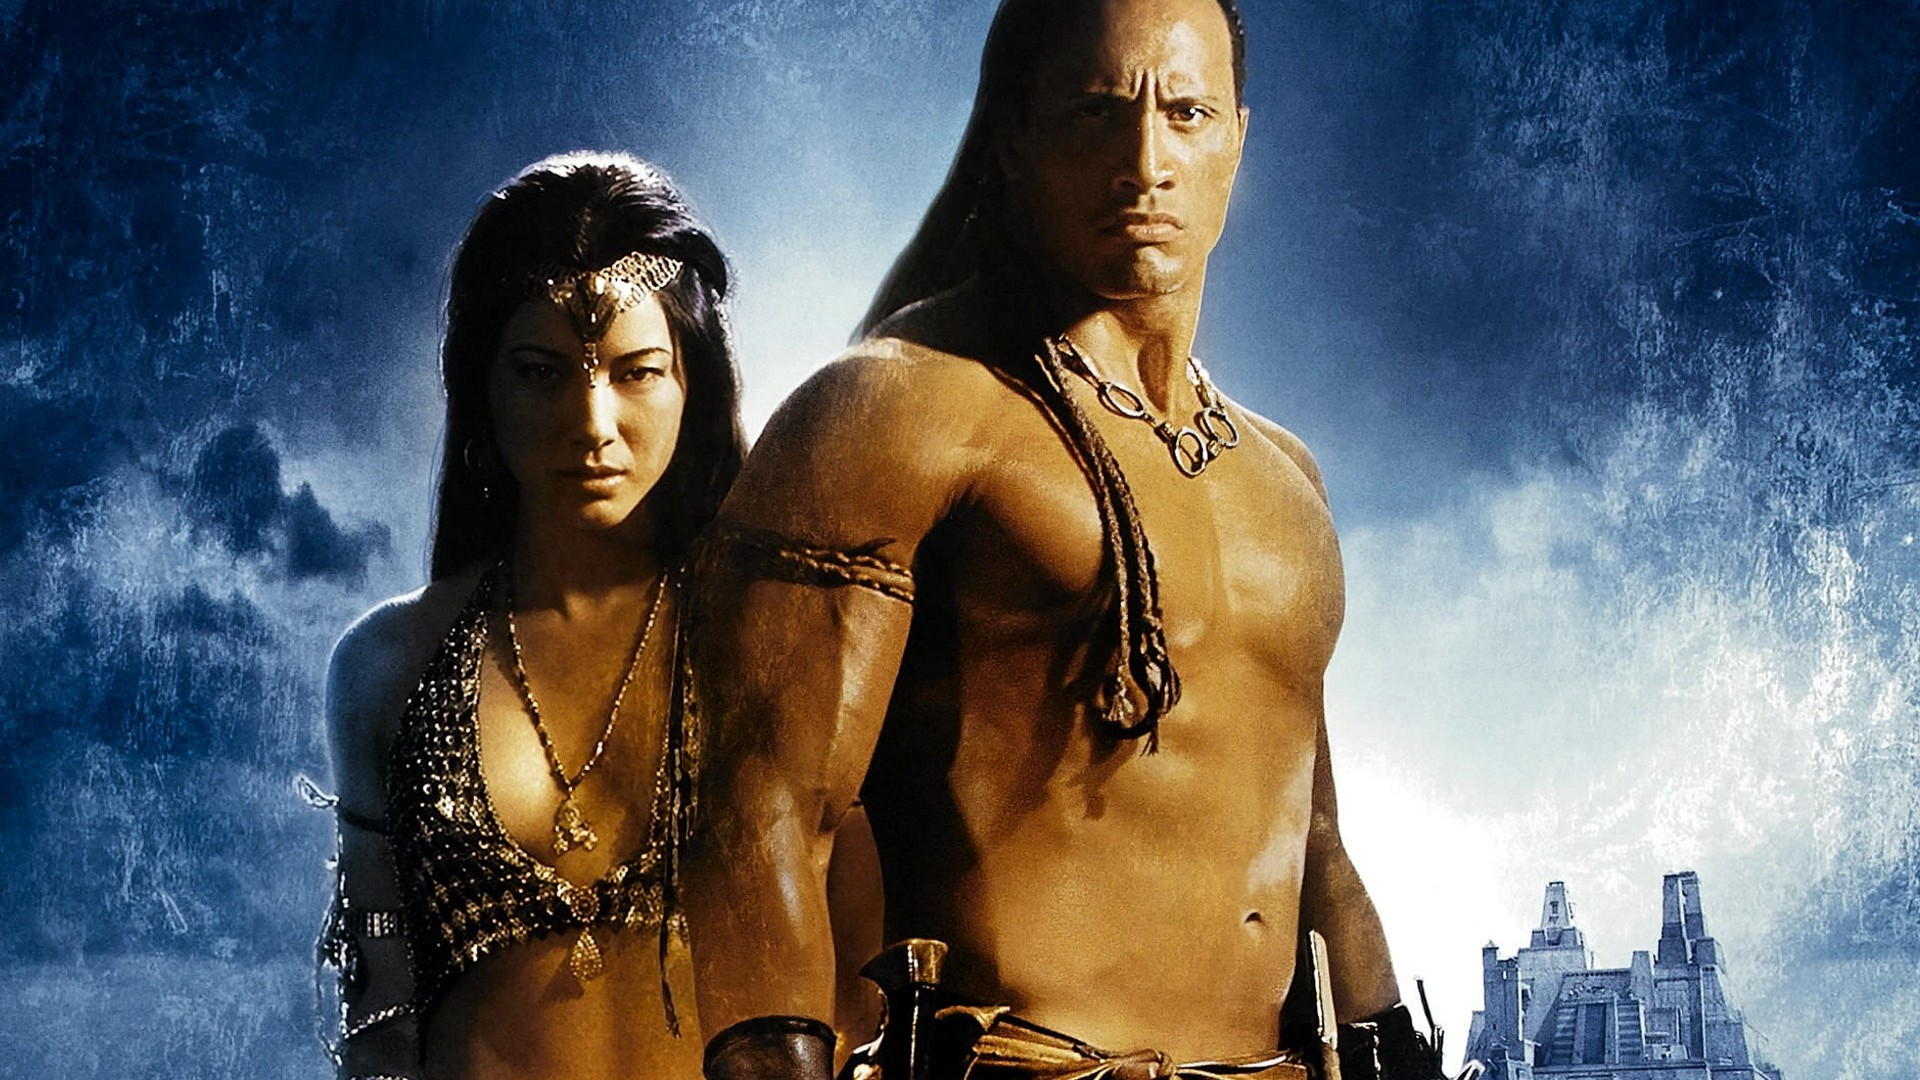 scorpion king in hindi full movie download